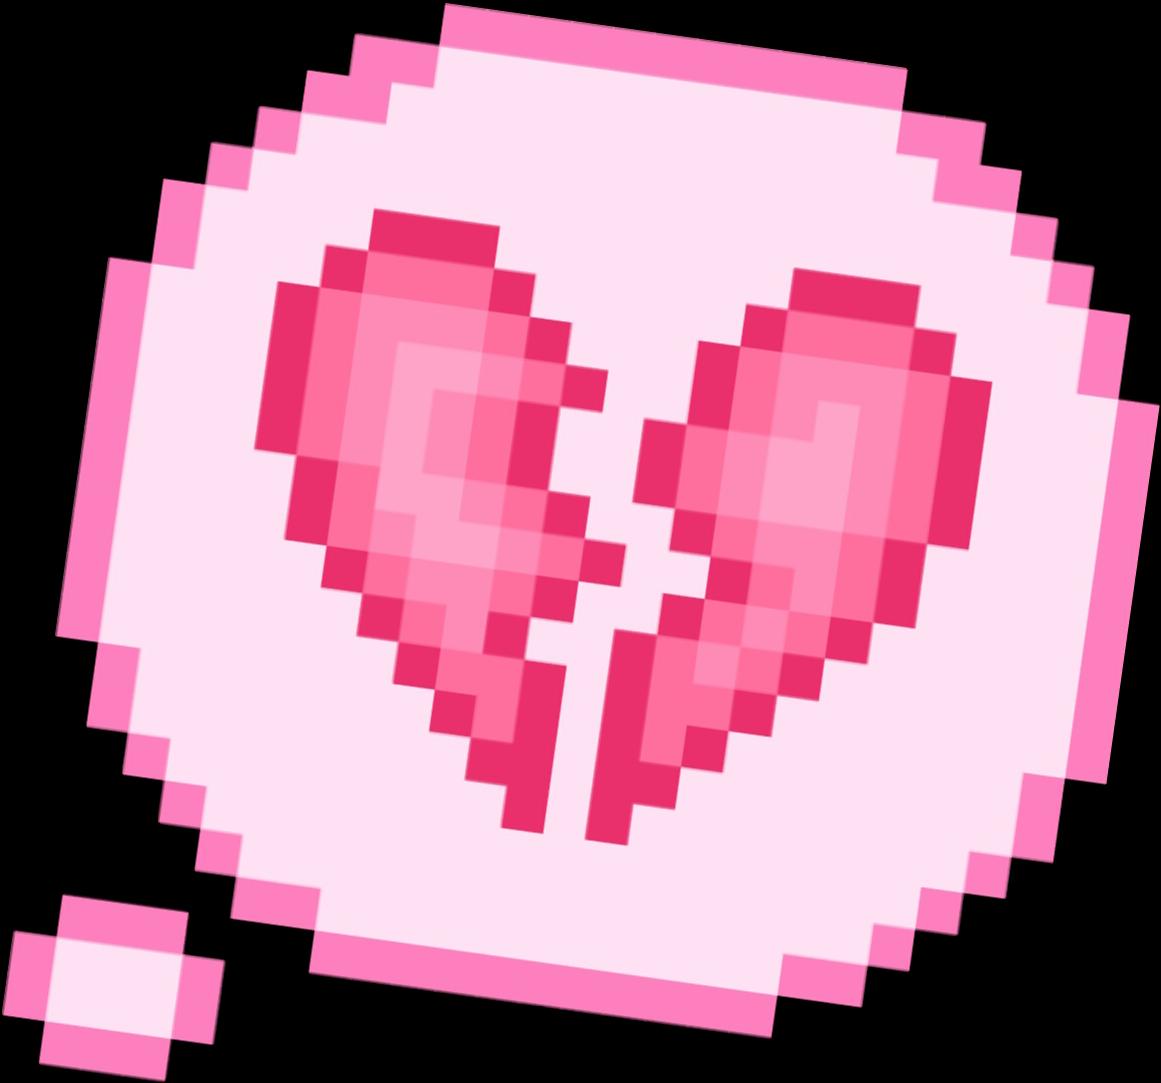 Pixel Art Epic Face (1161x1083), Png Download